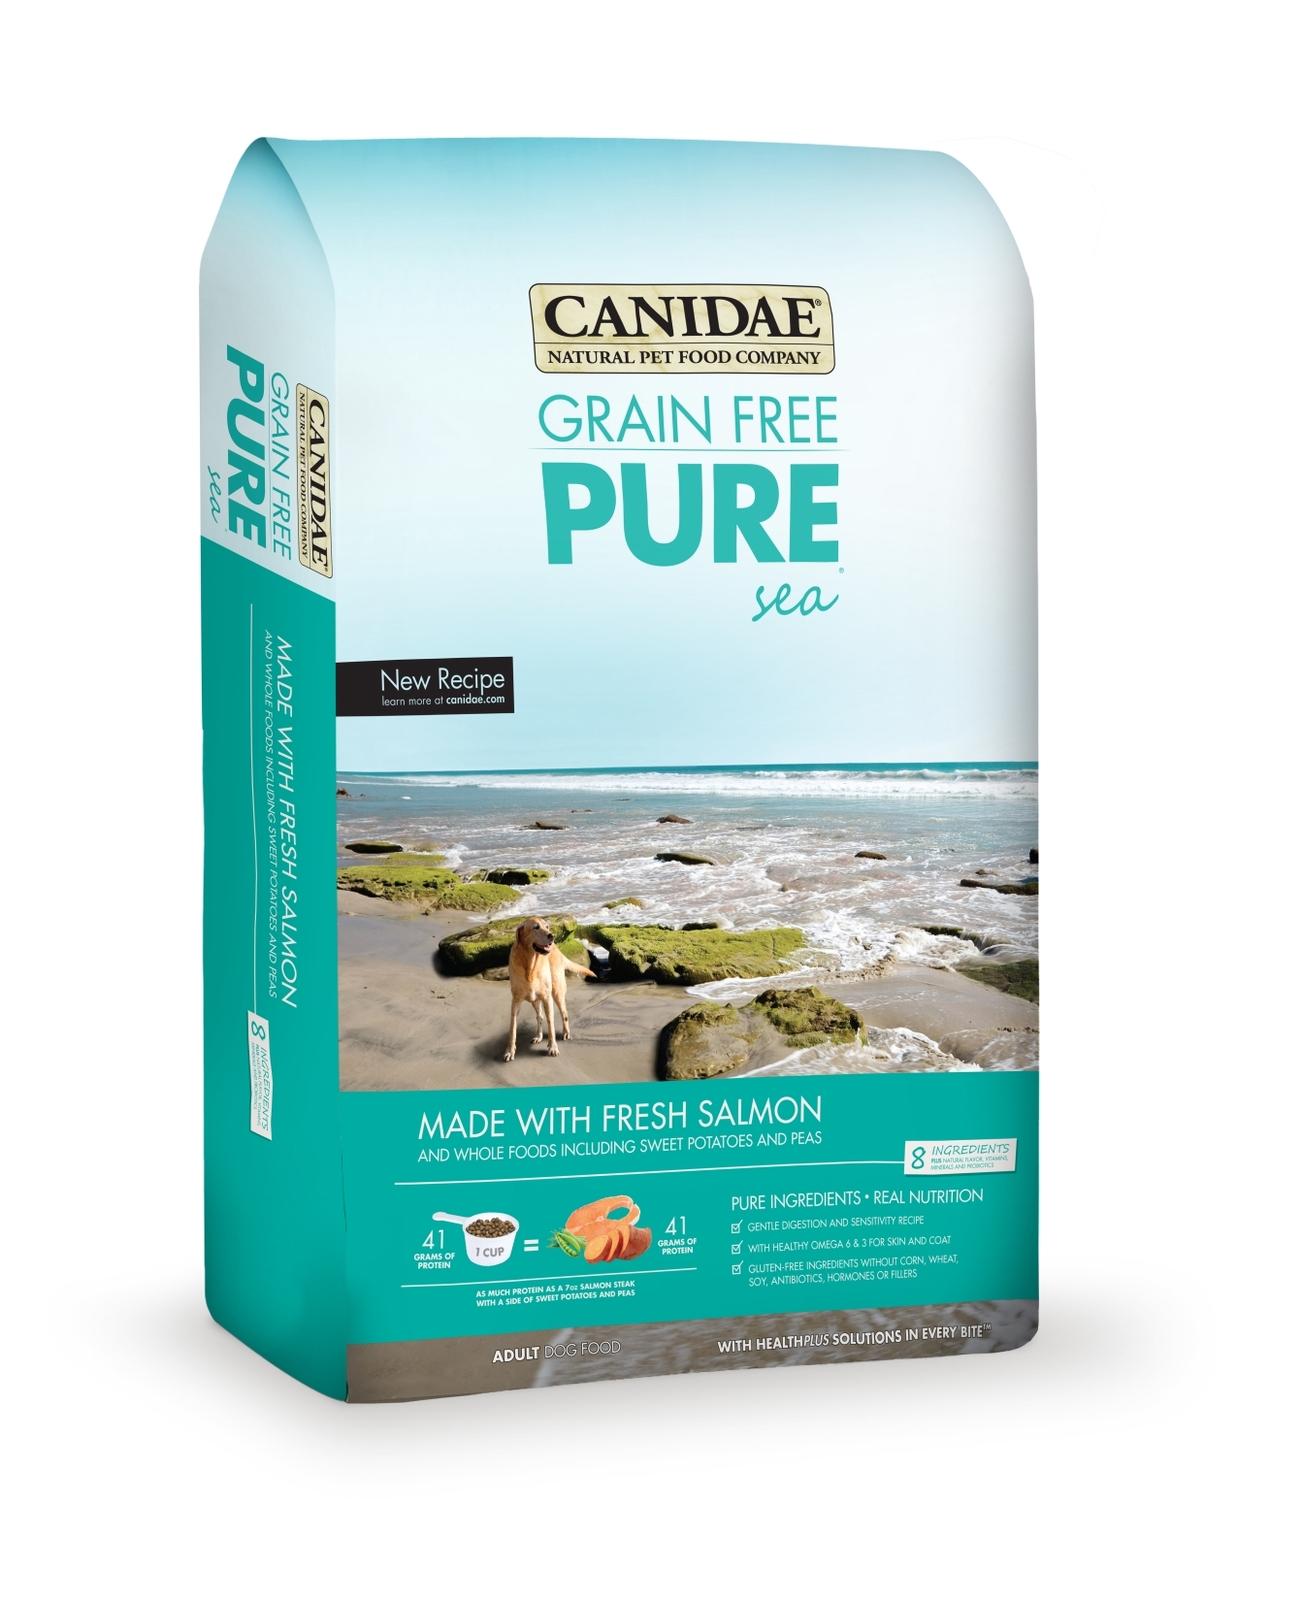 Canidae petfood plus canidae forumfinder Images